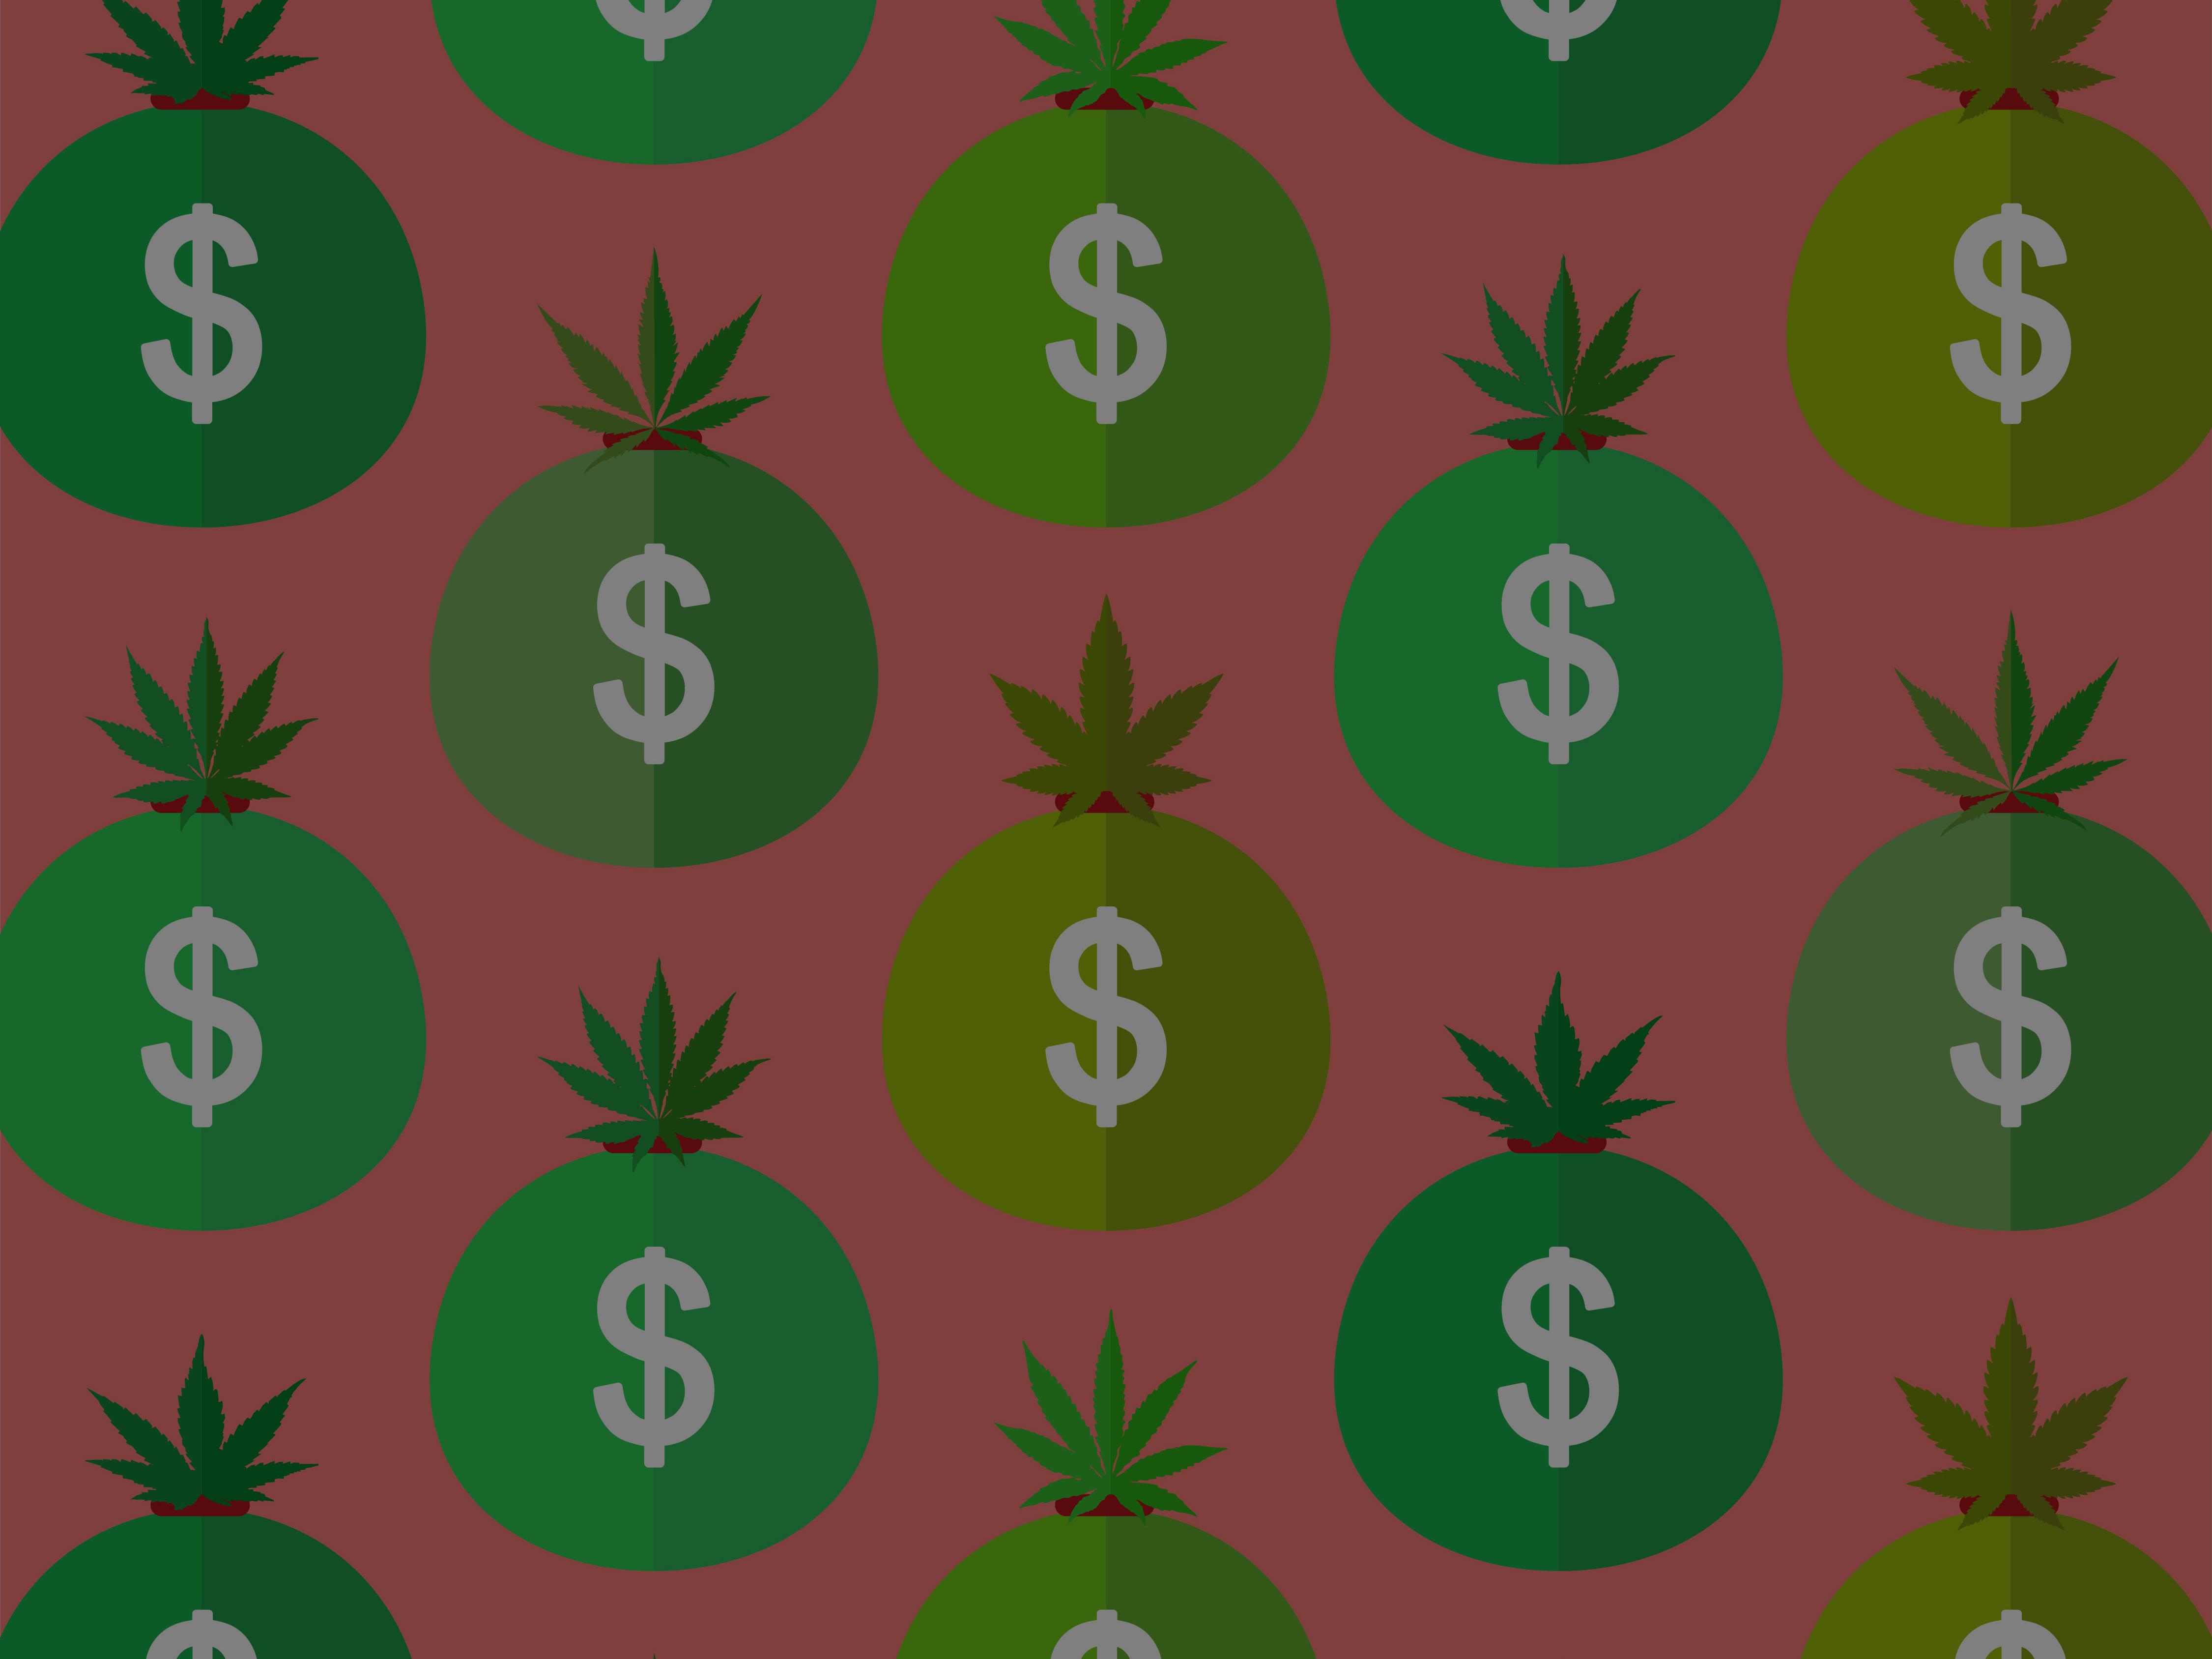 Image: https://a.storyblok.com/f/114448/4501x3375/26a5399721/the-movement-to-legalize-marijuana-4x3.jpg